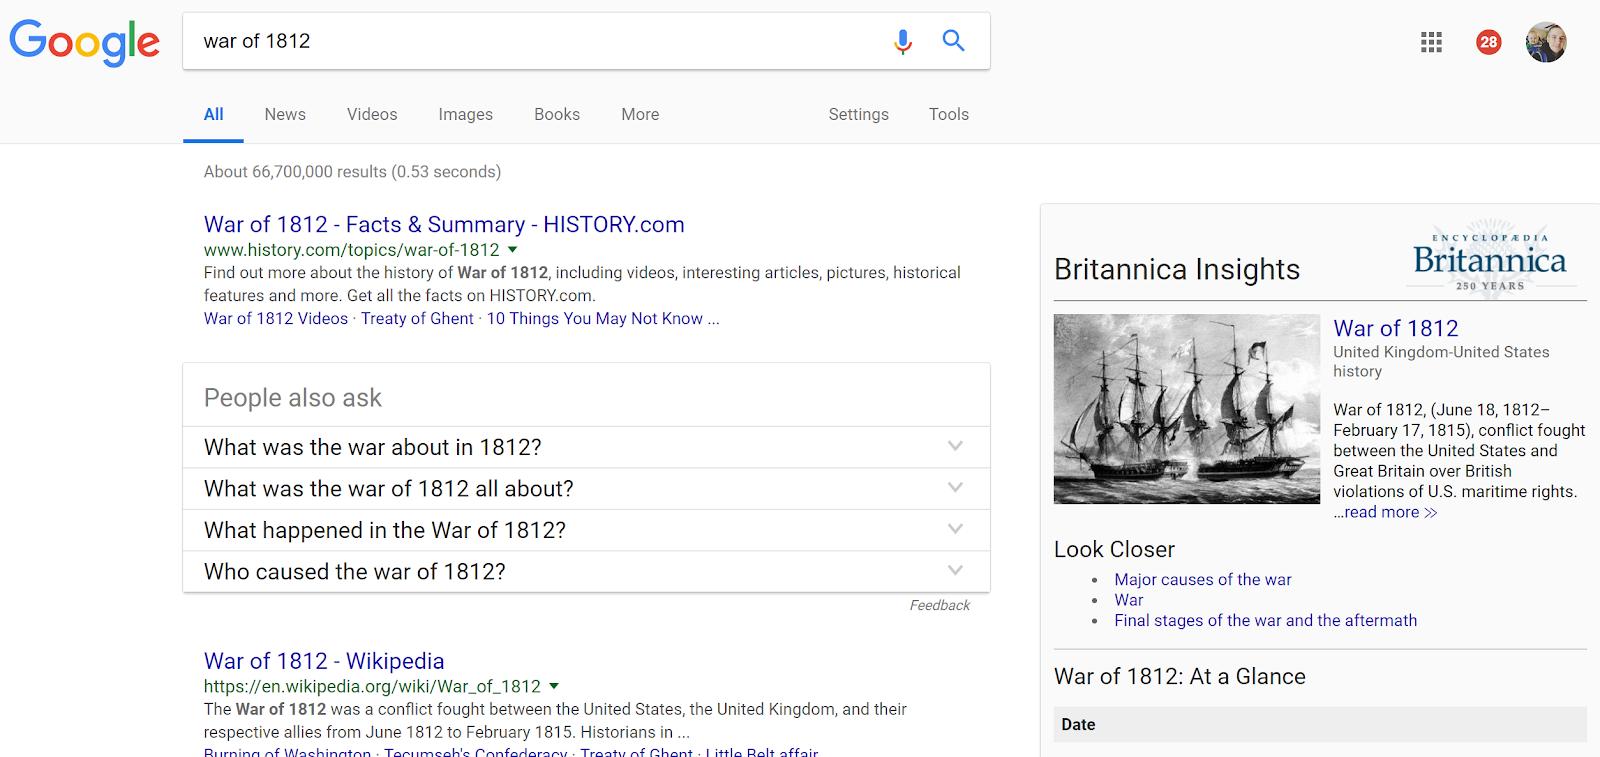 Free Technology for Teachers: Britannica Insights - A Chrome